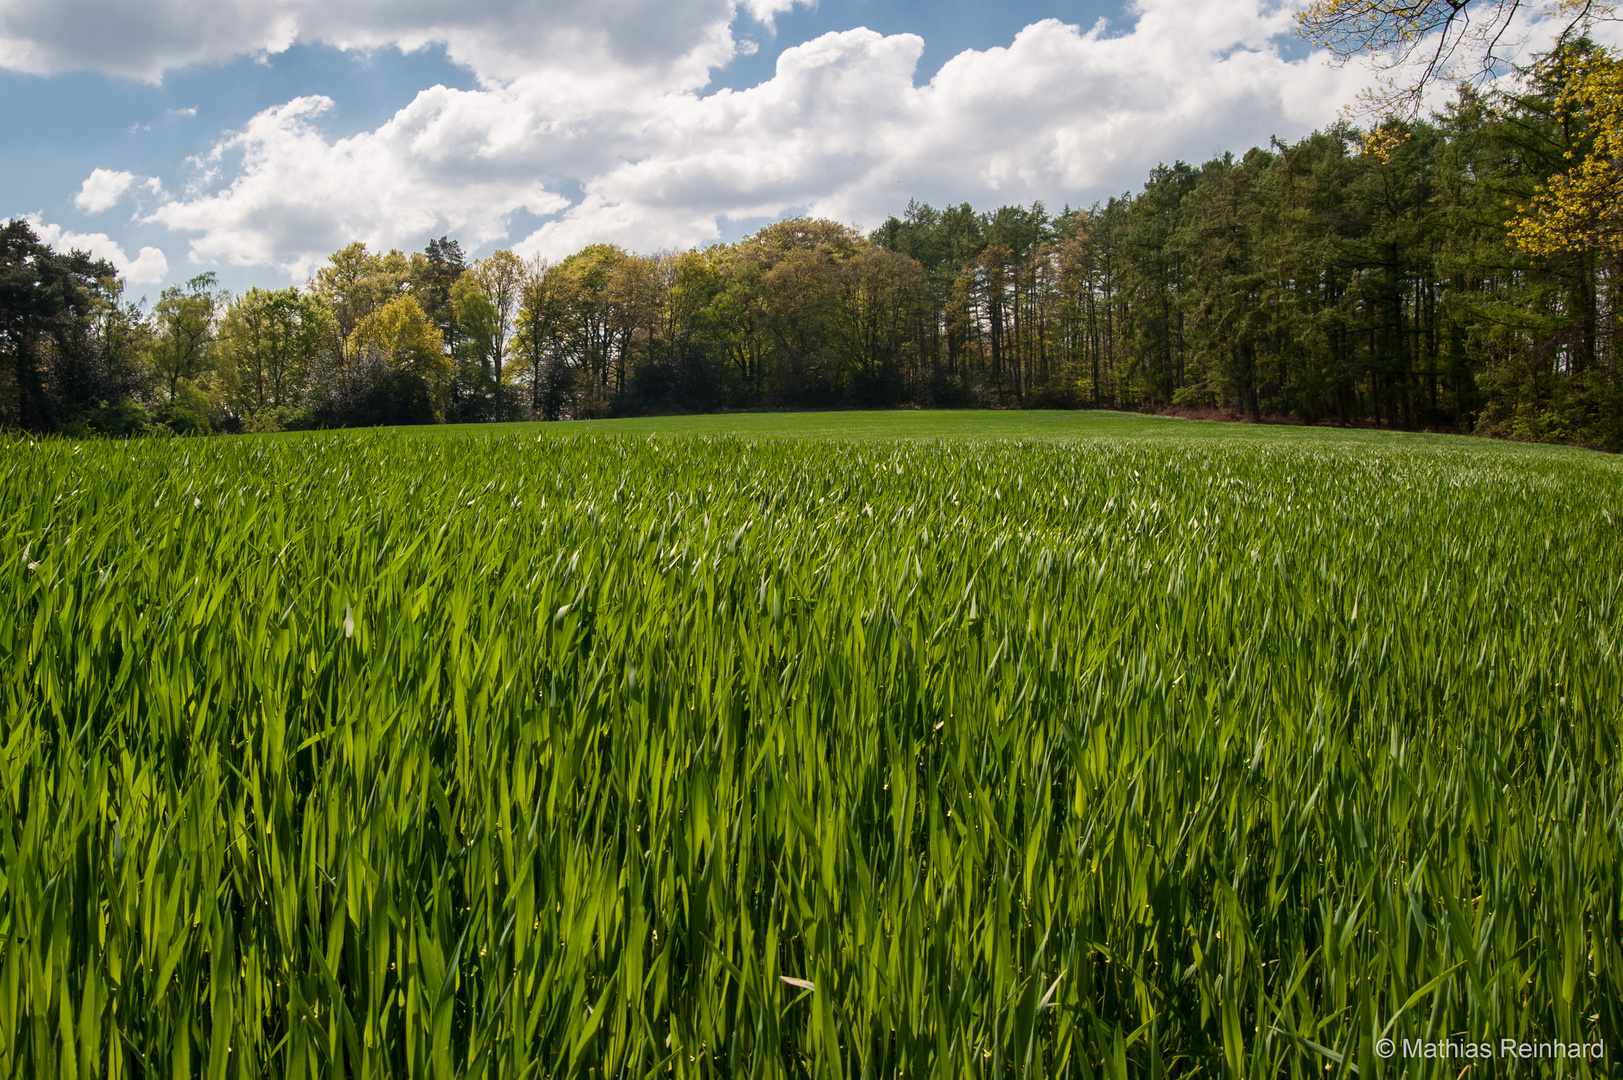 Frühling in Feld und Flur